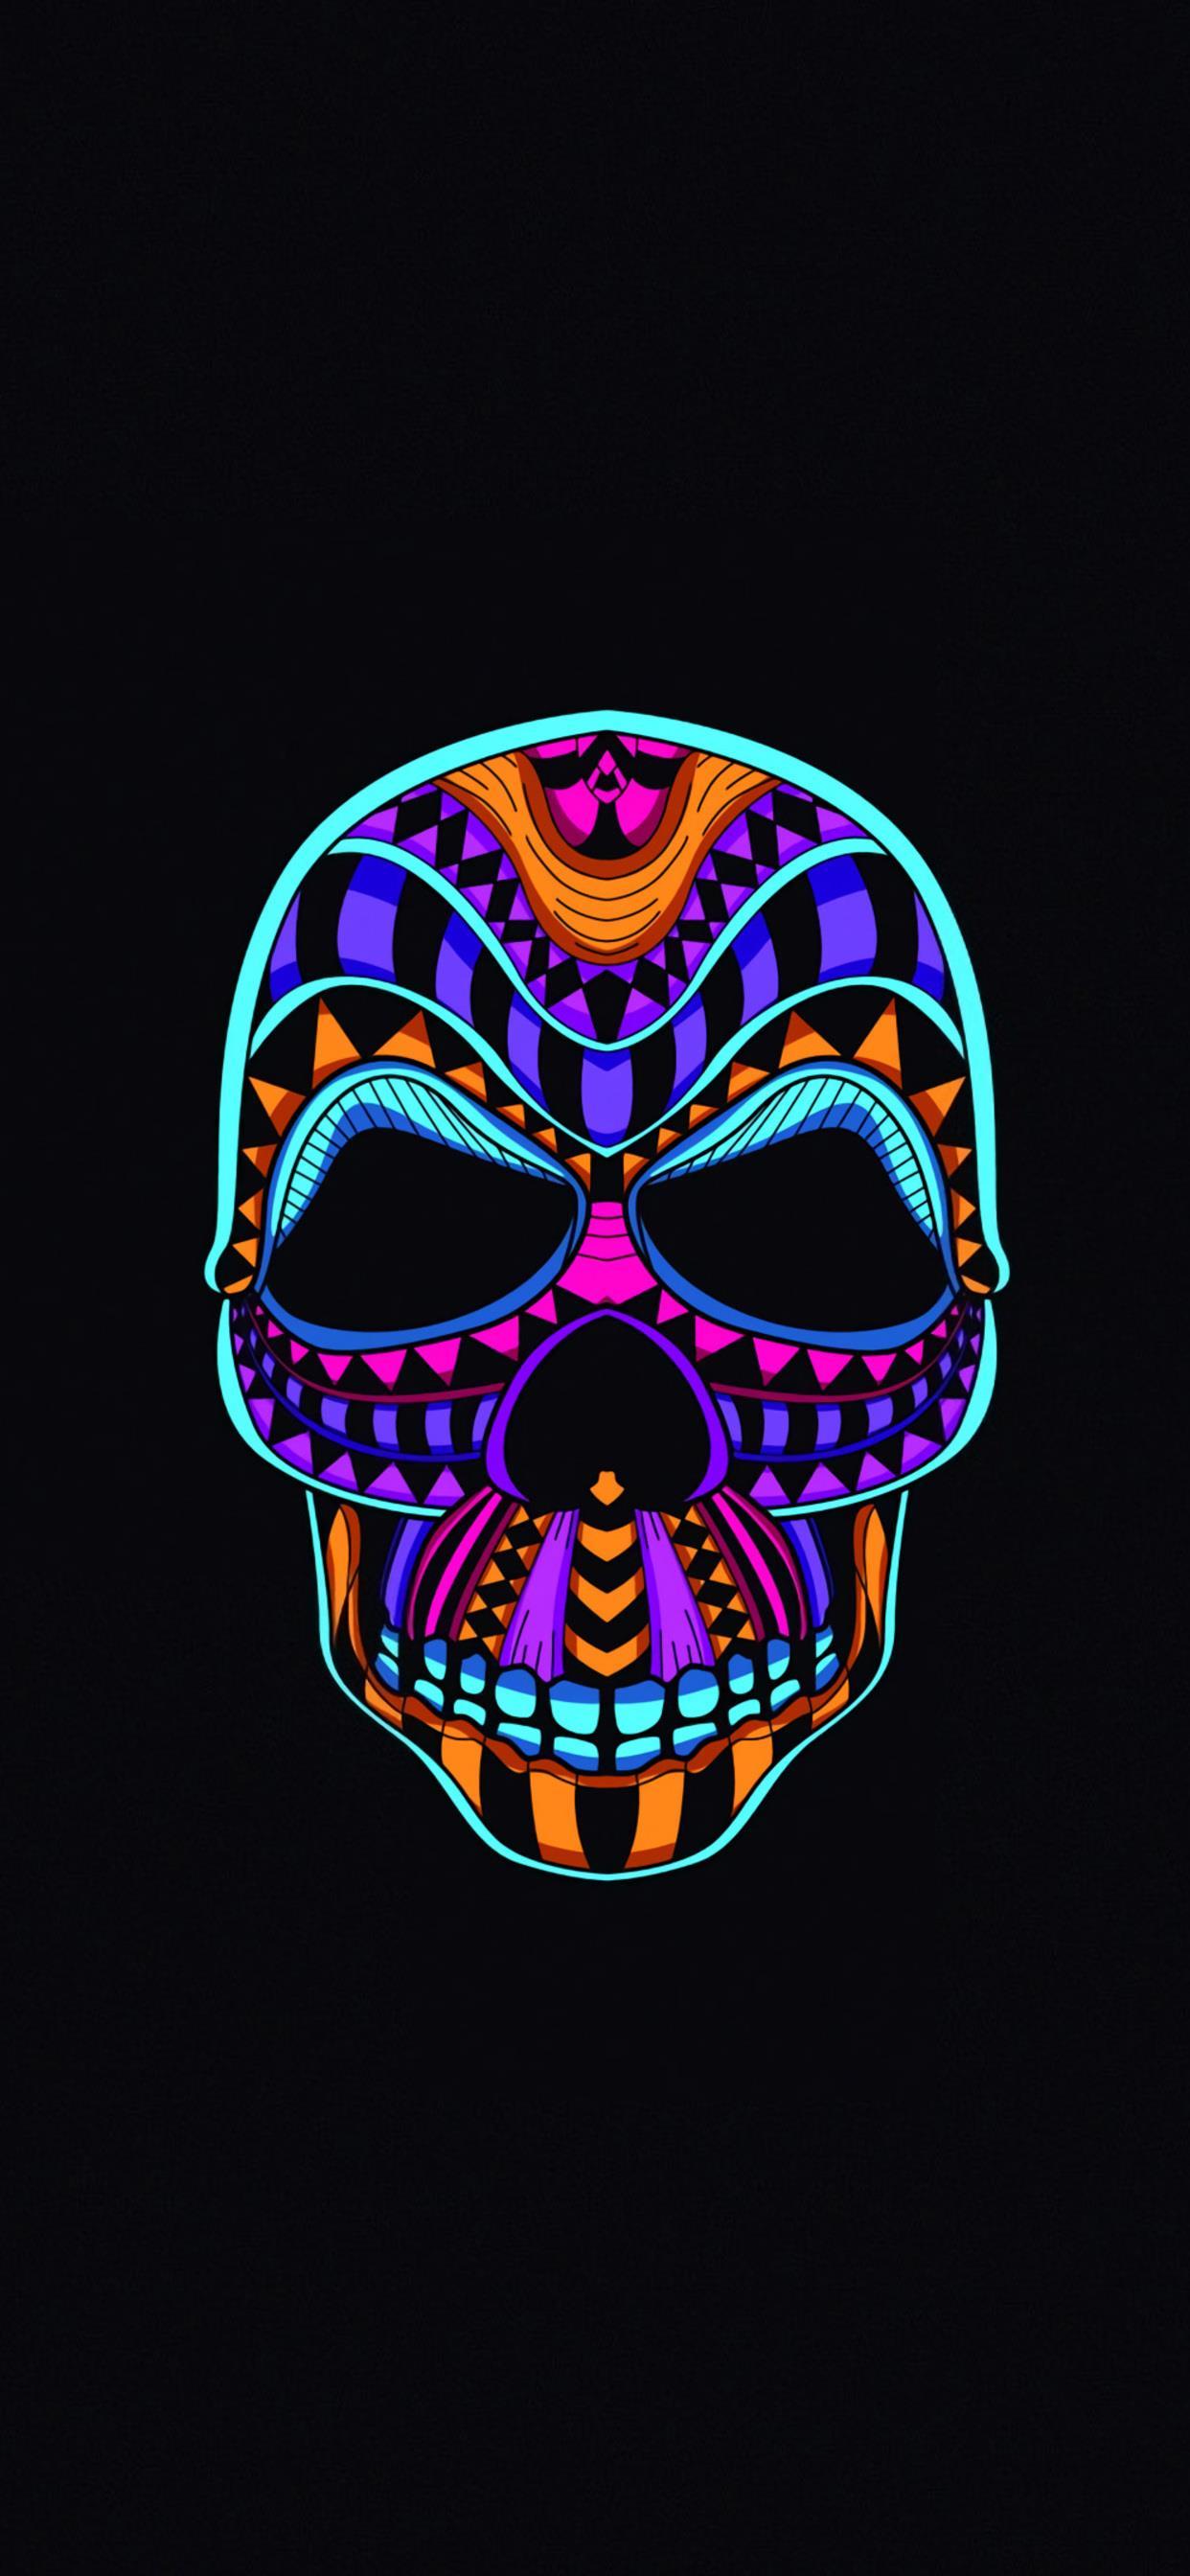 Skull Dark Minimal 4k Iphone X Wallpapers Free Download